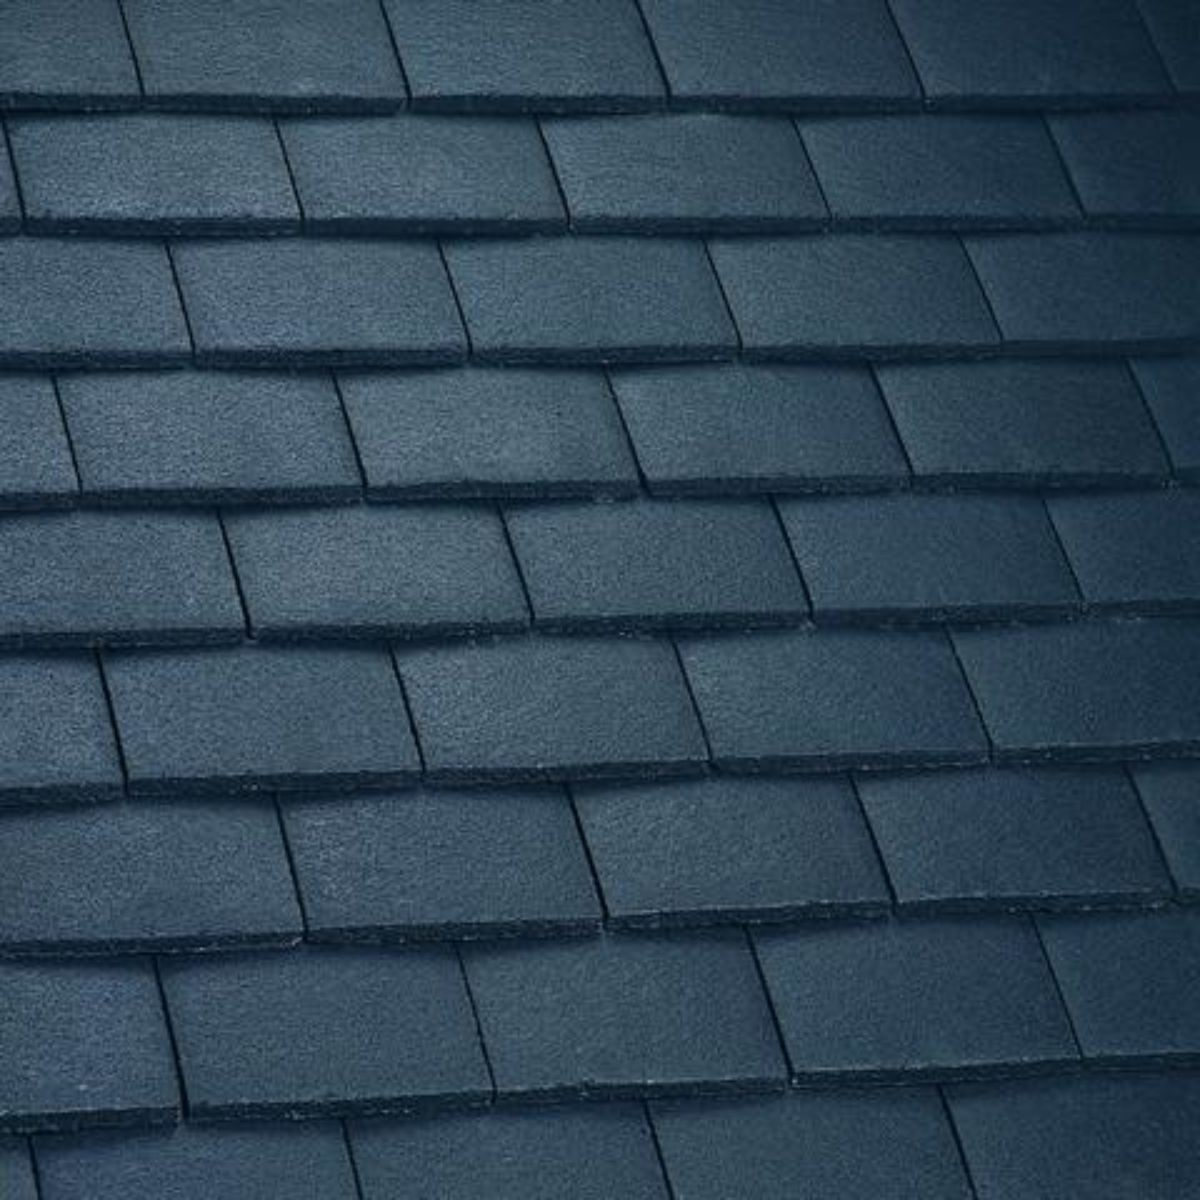 Marley Plain Tile Interlocking Concrete Roof Tile